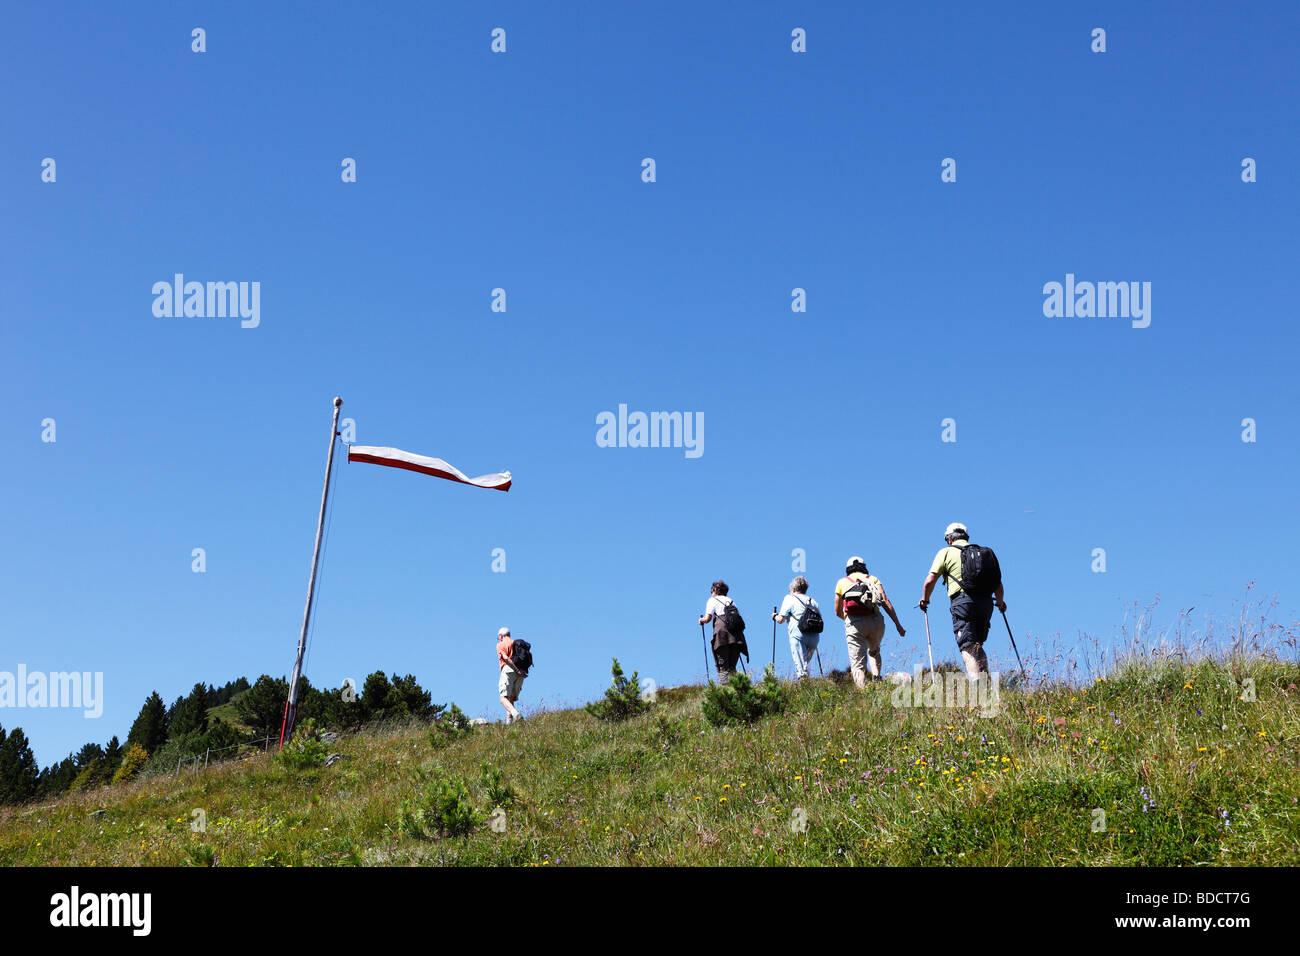 Hikers resting at Mt. Patscherkofel, Tux Alps, Tyrol, Austria, Europe Stock Photo